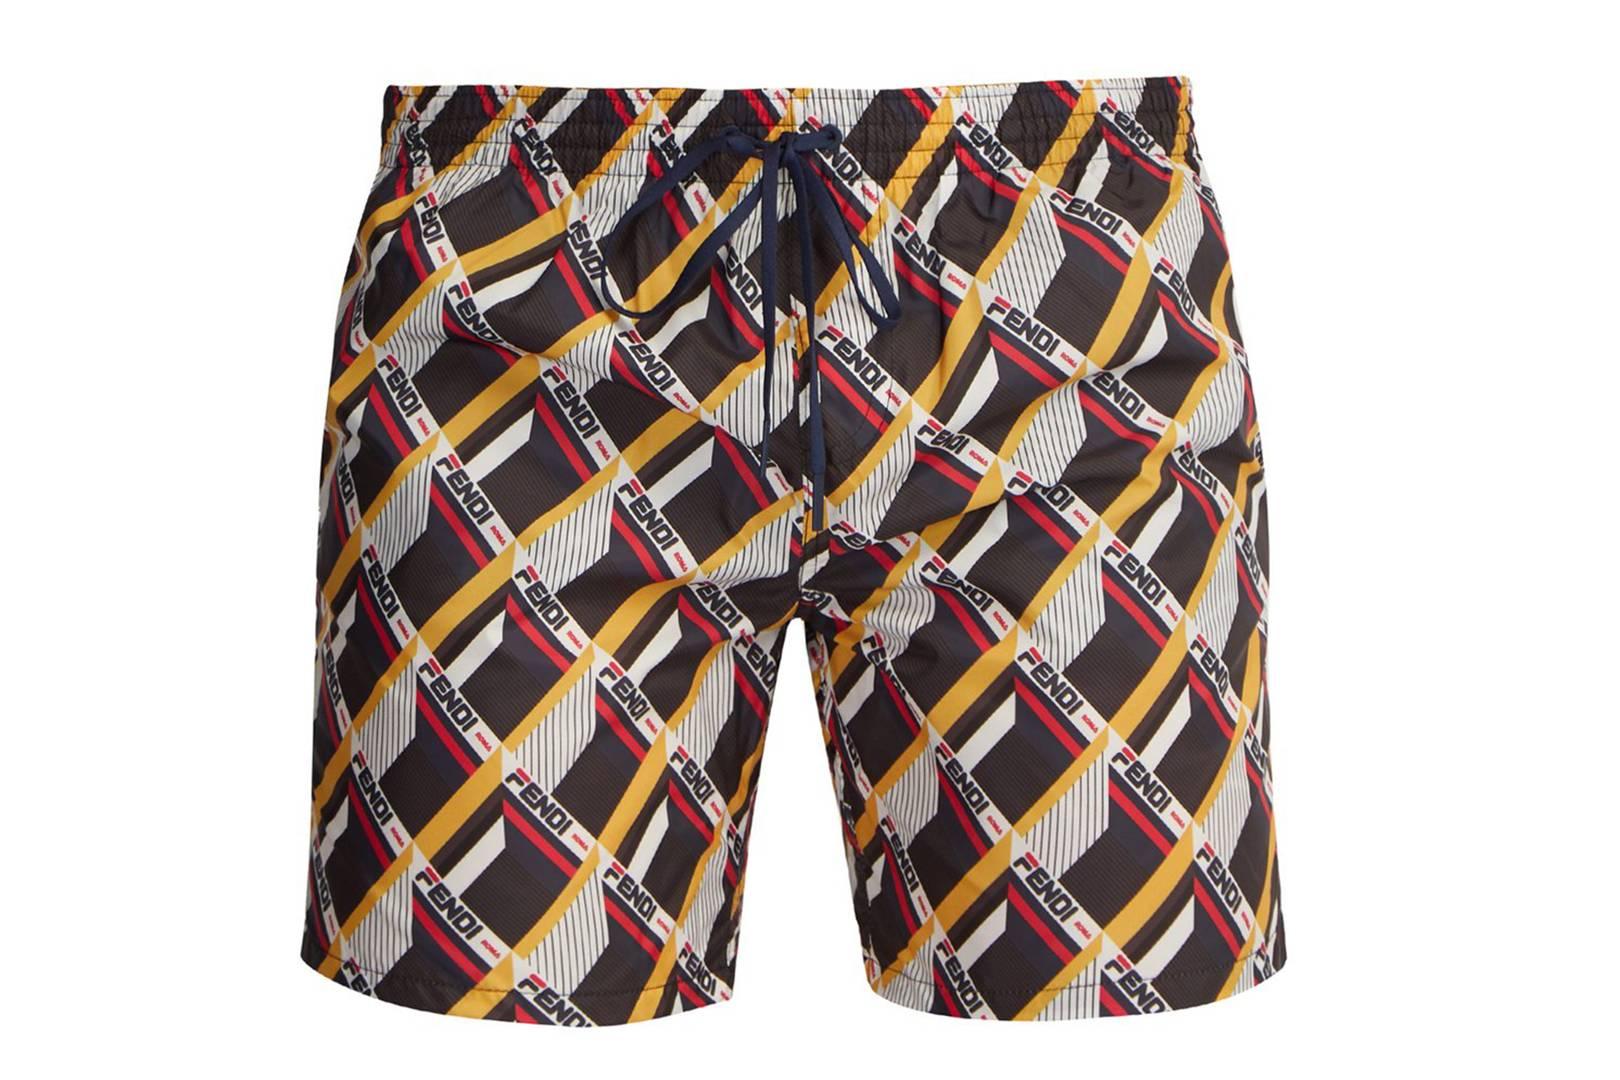 87b22fd5f4 Best men's swim shorts for summer   British GQ